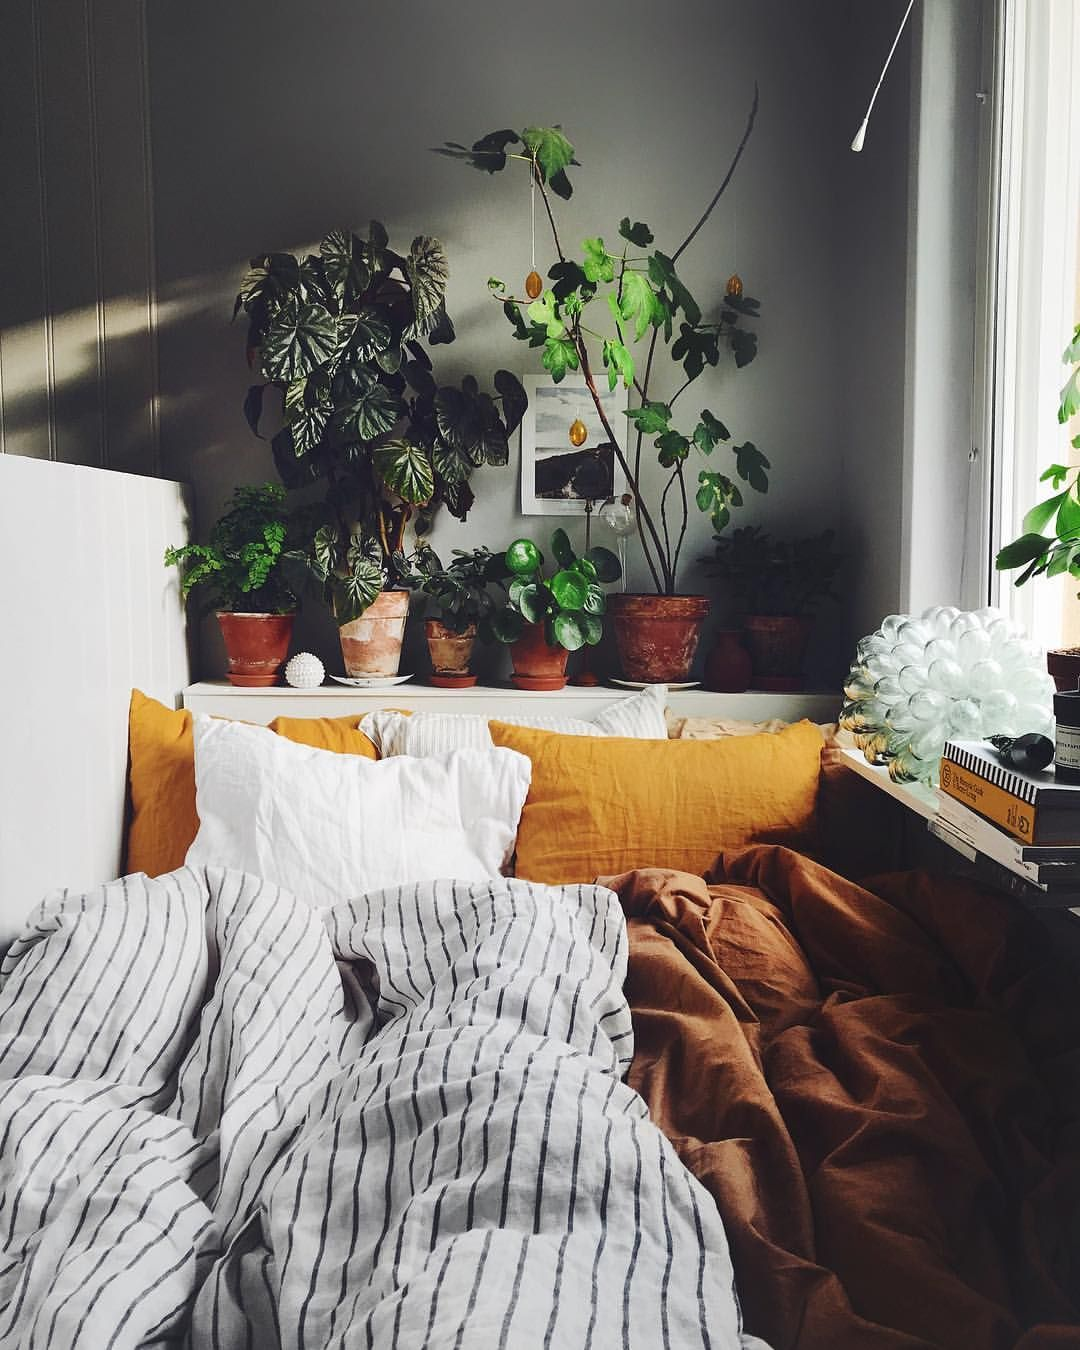 Kv llssol in i sovrummet fin kv ll Bedroom  design